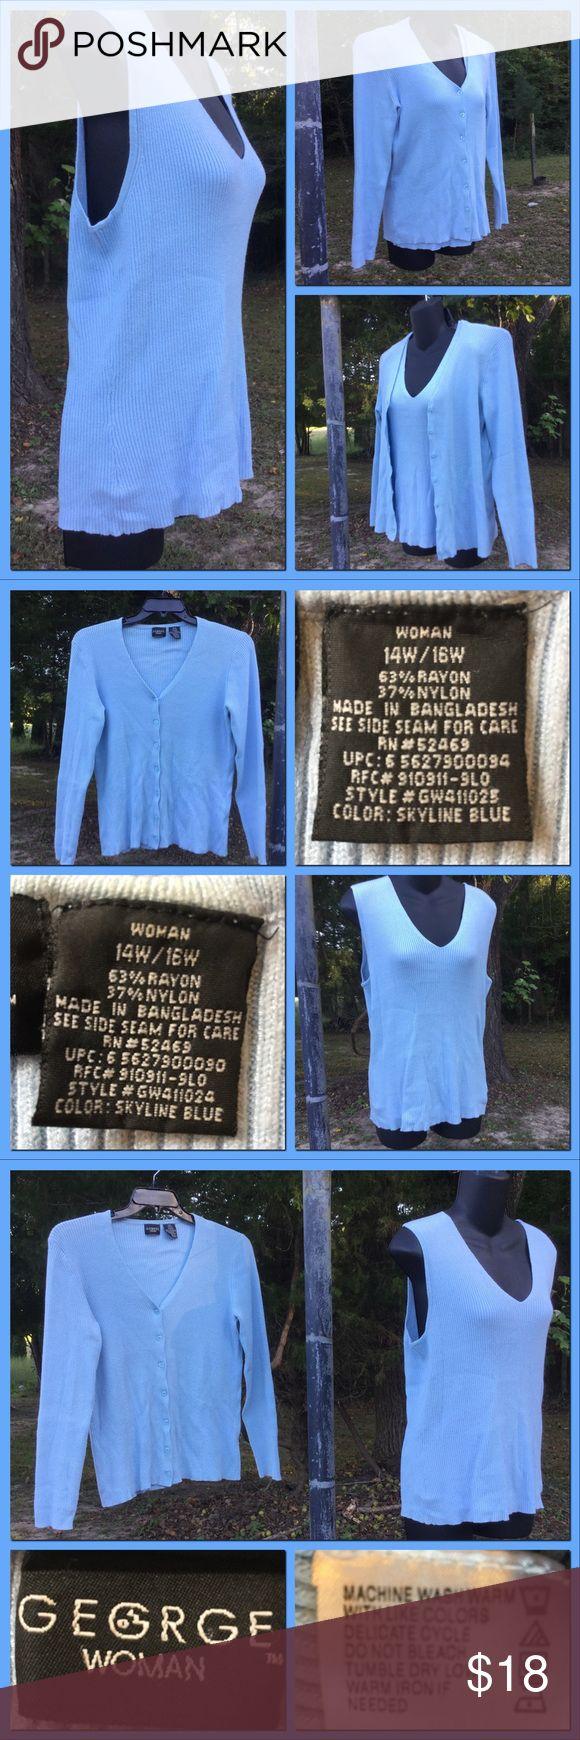 "Sky blue Twin Set EUC. Real nice. Measurements: CARDI: shoulders 14"" sleeves 22.5"" Pit2pit 19.5"" length 24"" hem 18"" TANK: shoulders 15"" Pit2pit 17"" Length 23"" hem 18"".    Tag reads sz. XL (14W-16W) George Women Sweaters Cardigans"